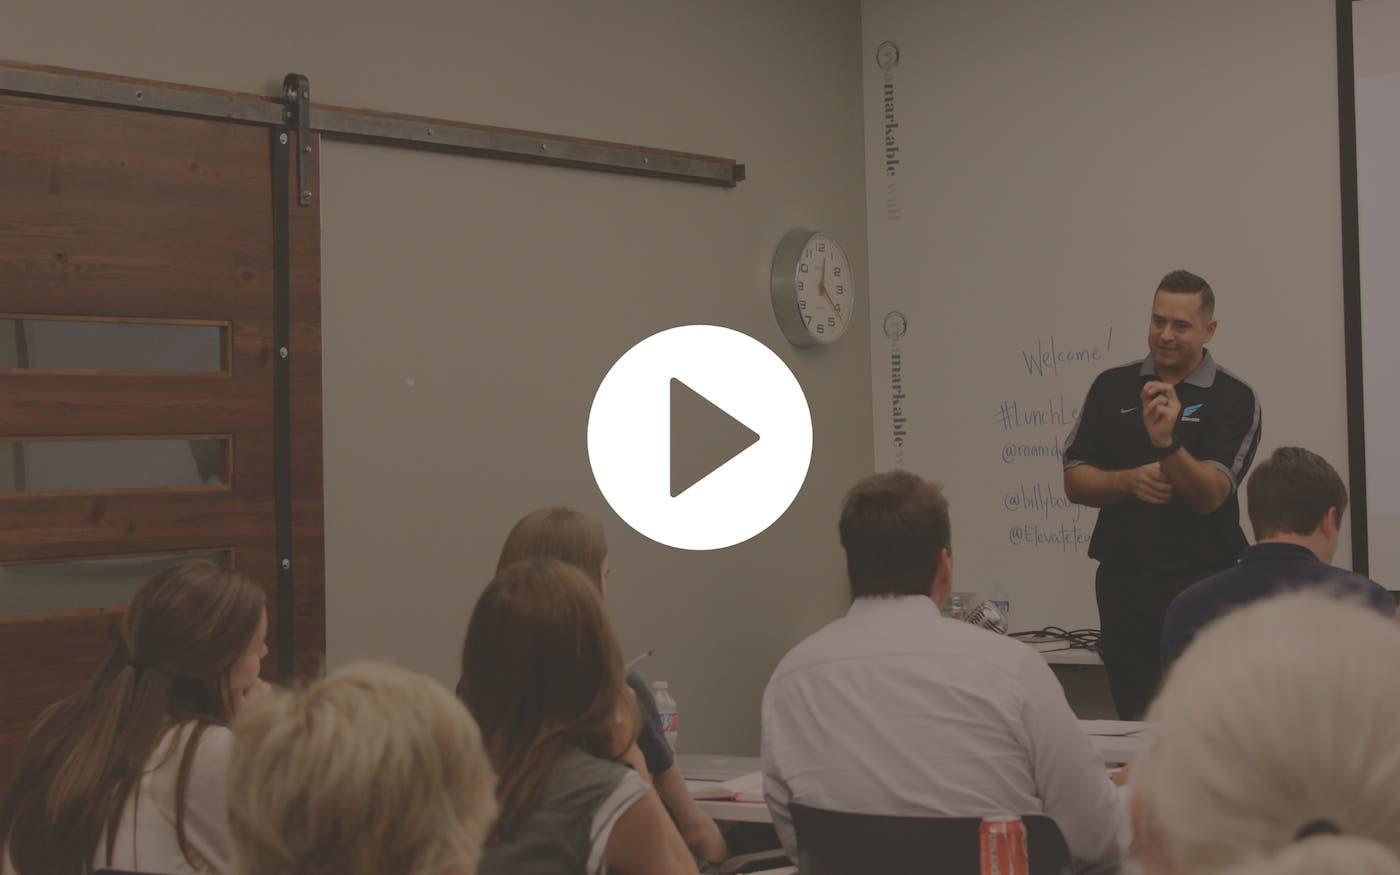 Video still of meeting happening in meeting space